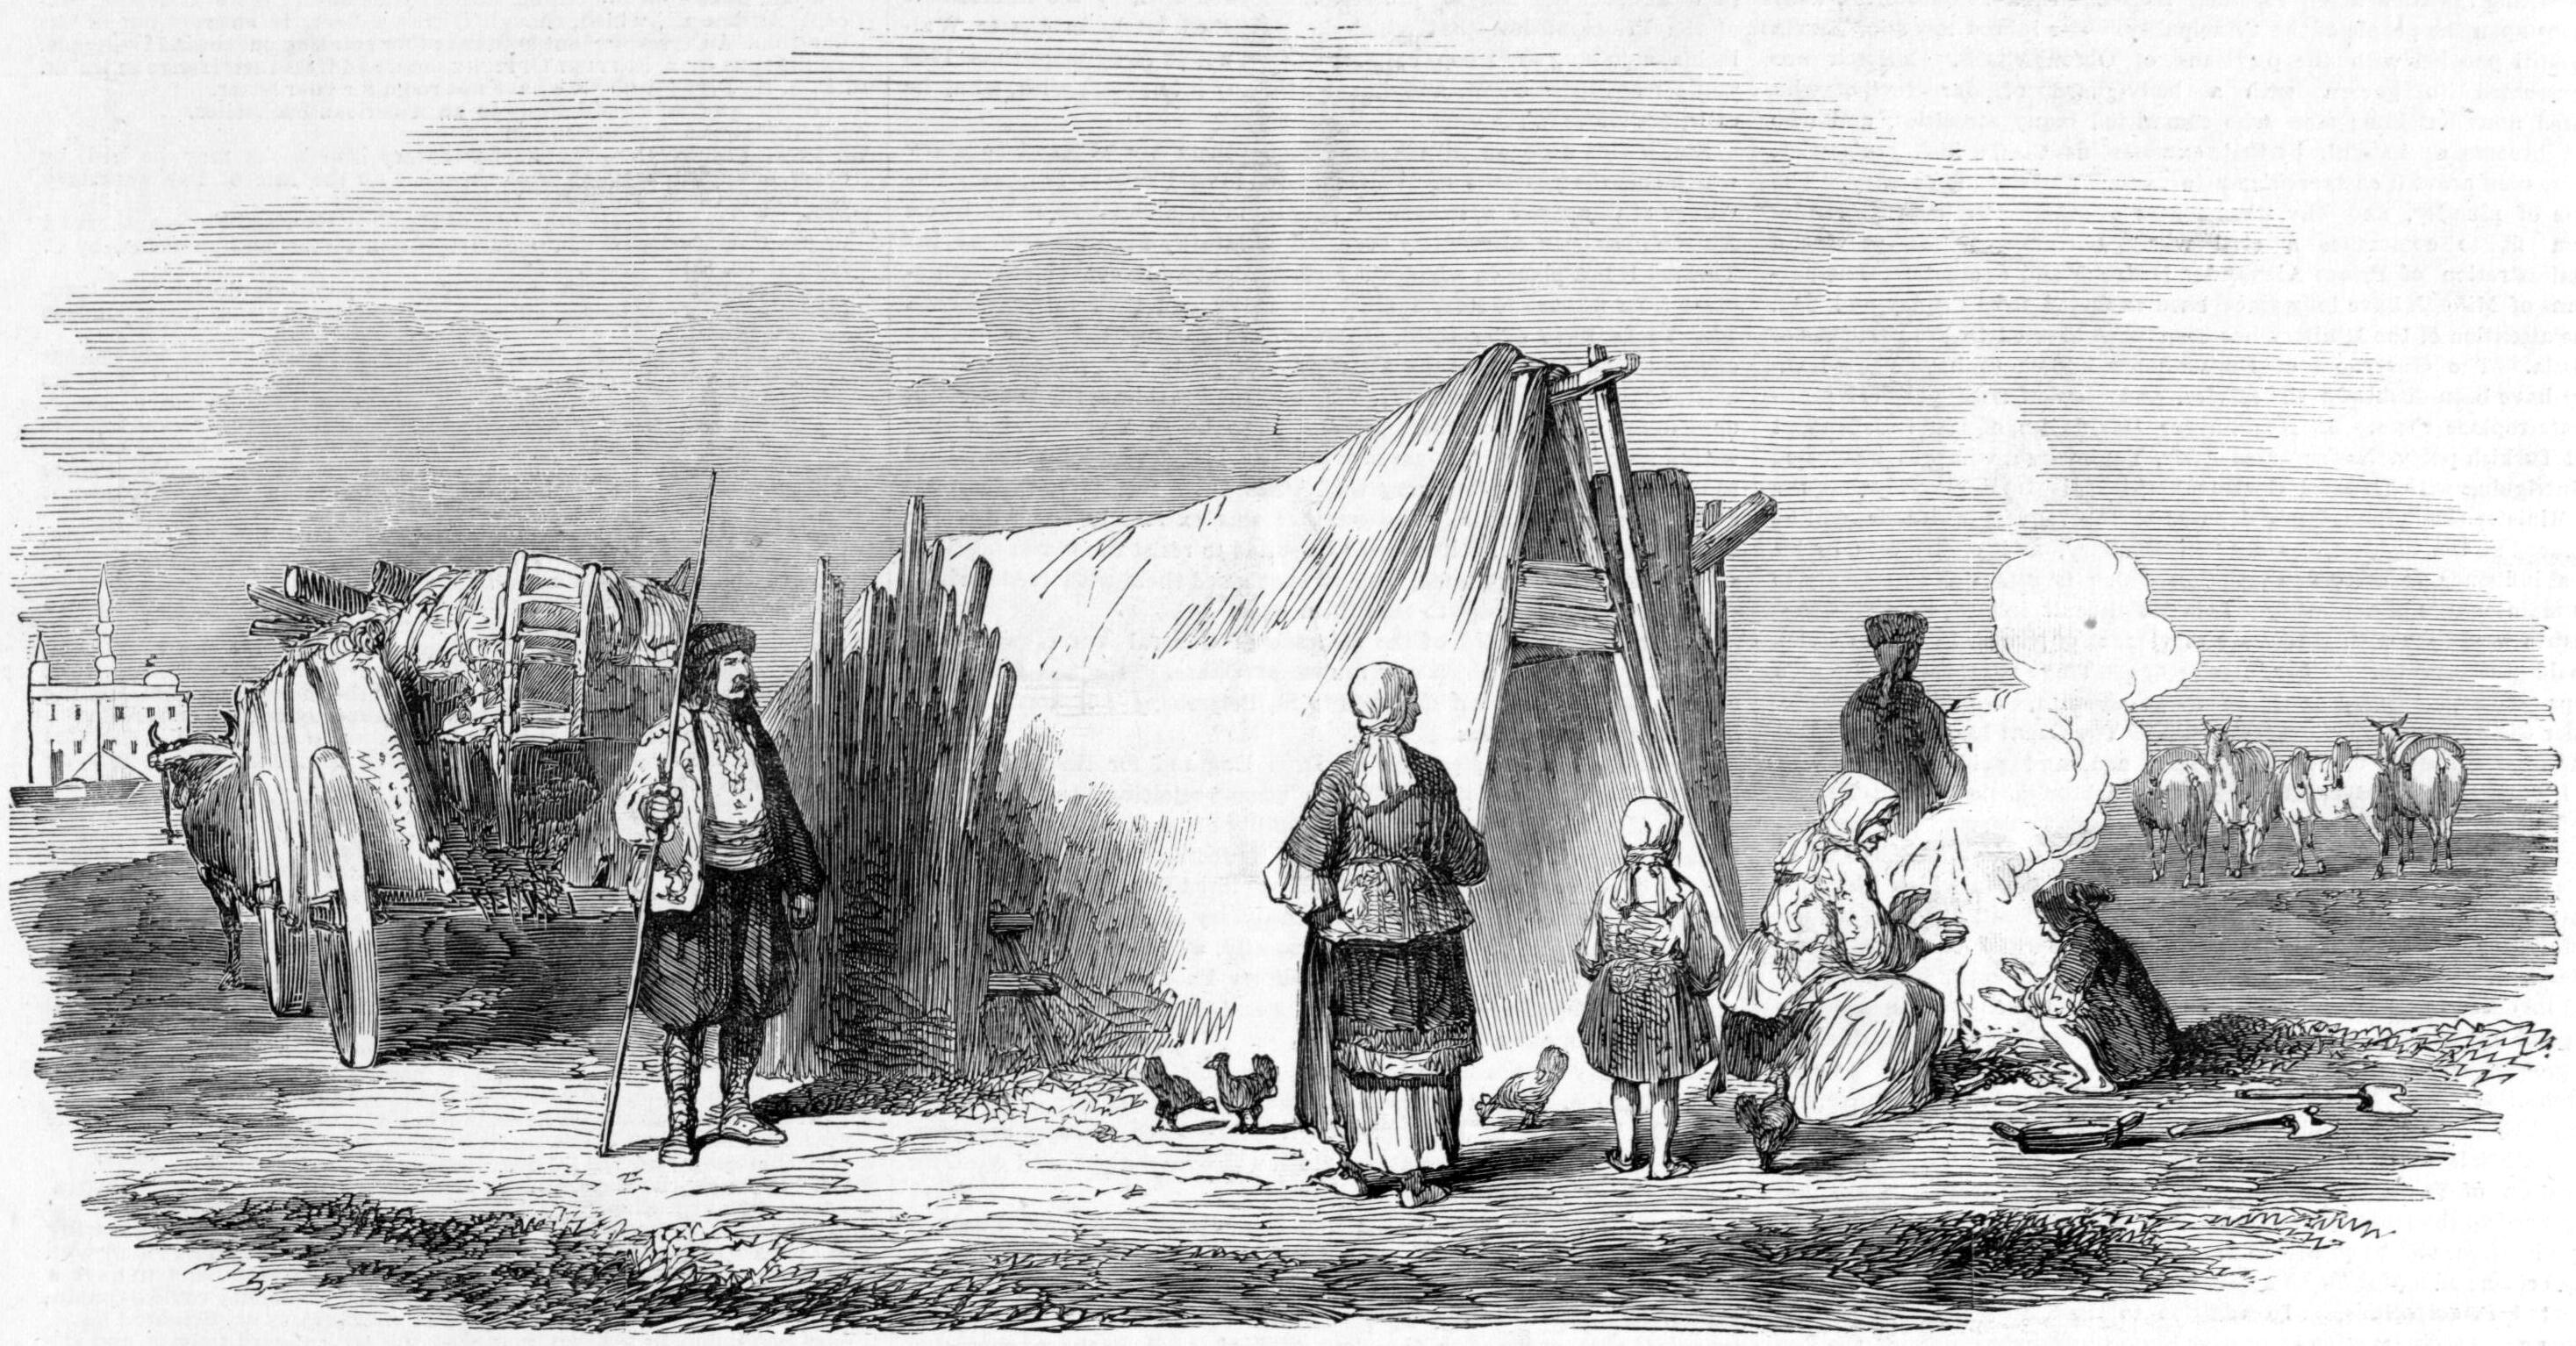 Wołosi-The Ilusstrated London News 25.03.1854.jpg